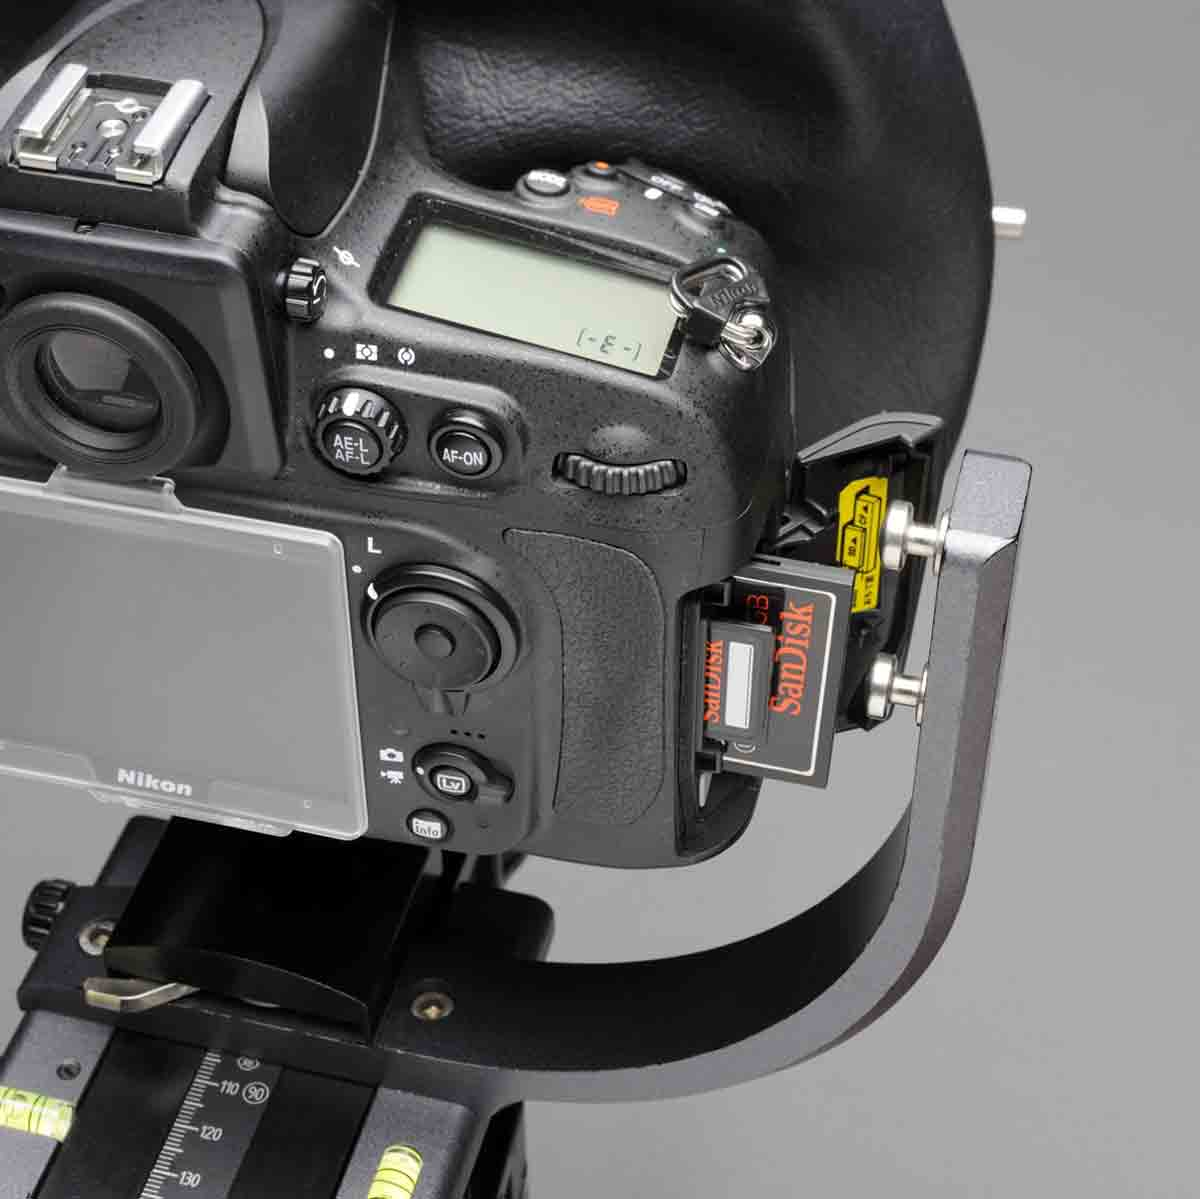 Nikon-D800-Cambo-X2-Pro-Schneider-Kreuznach-APO-90mm-f4.5-17